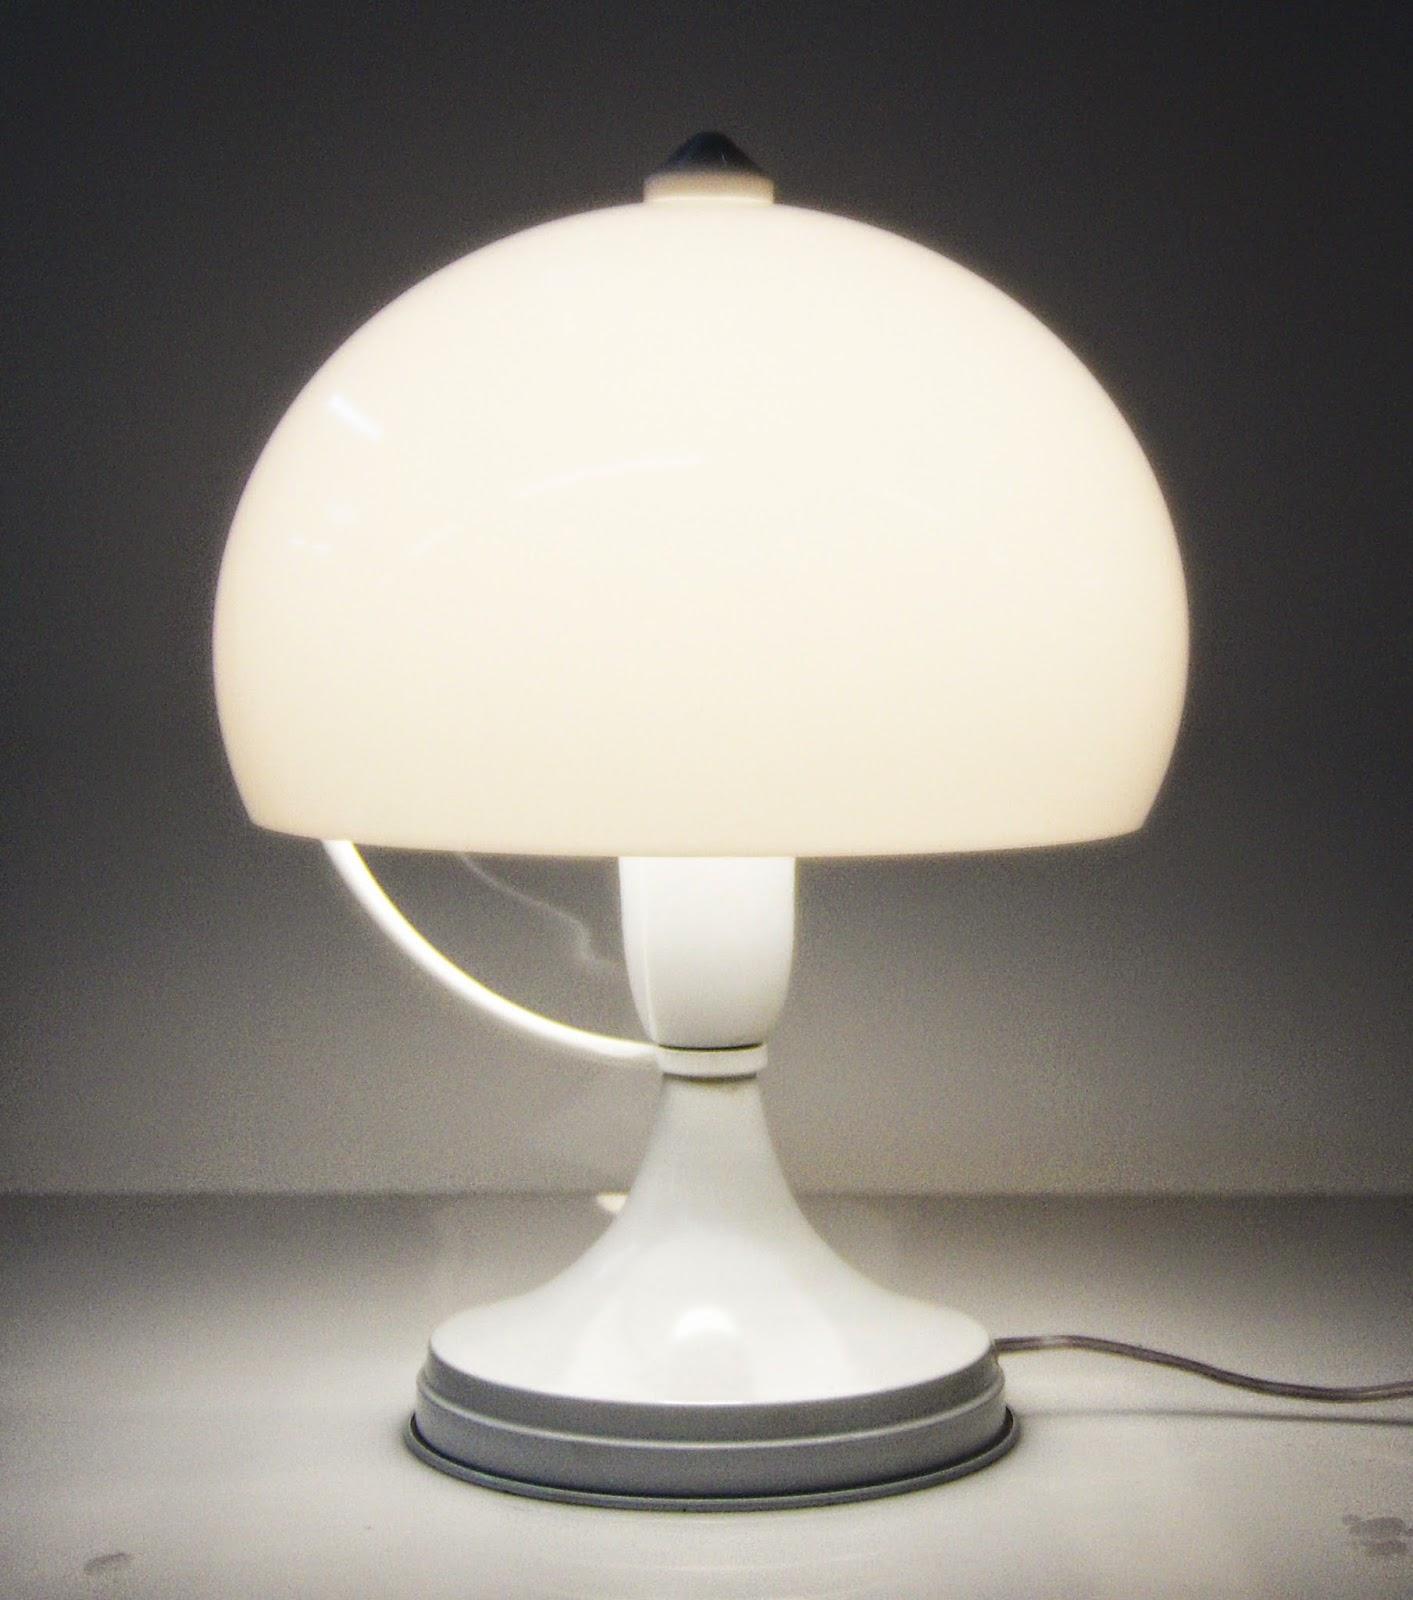 Ludica iluminacion lamparas de acrilico de techo colgantes - Como hacer lamparas de techo modernas ...